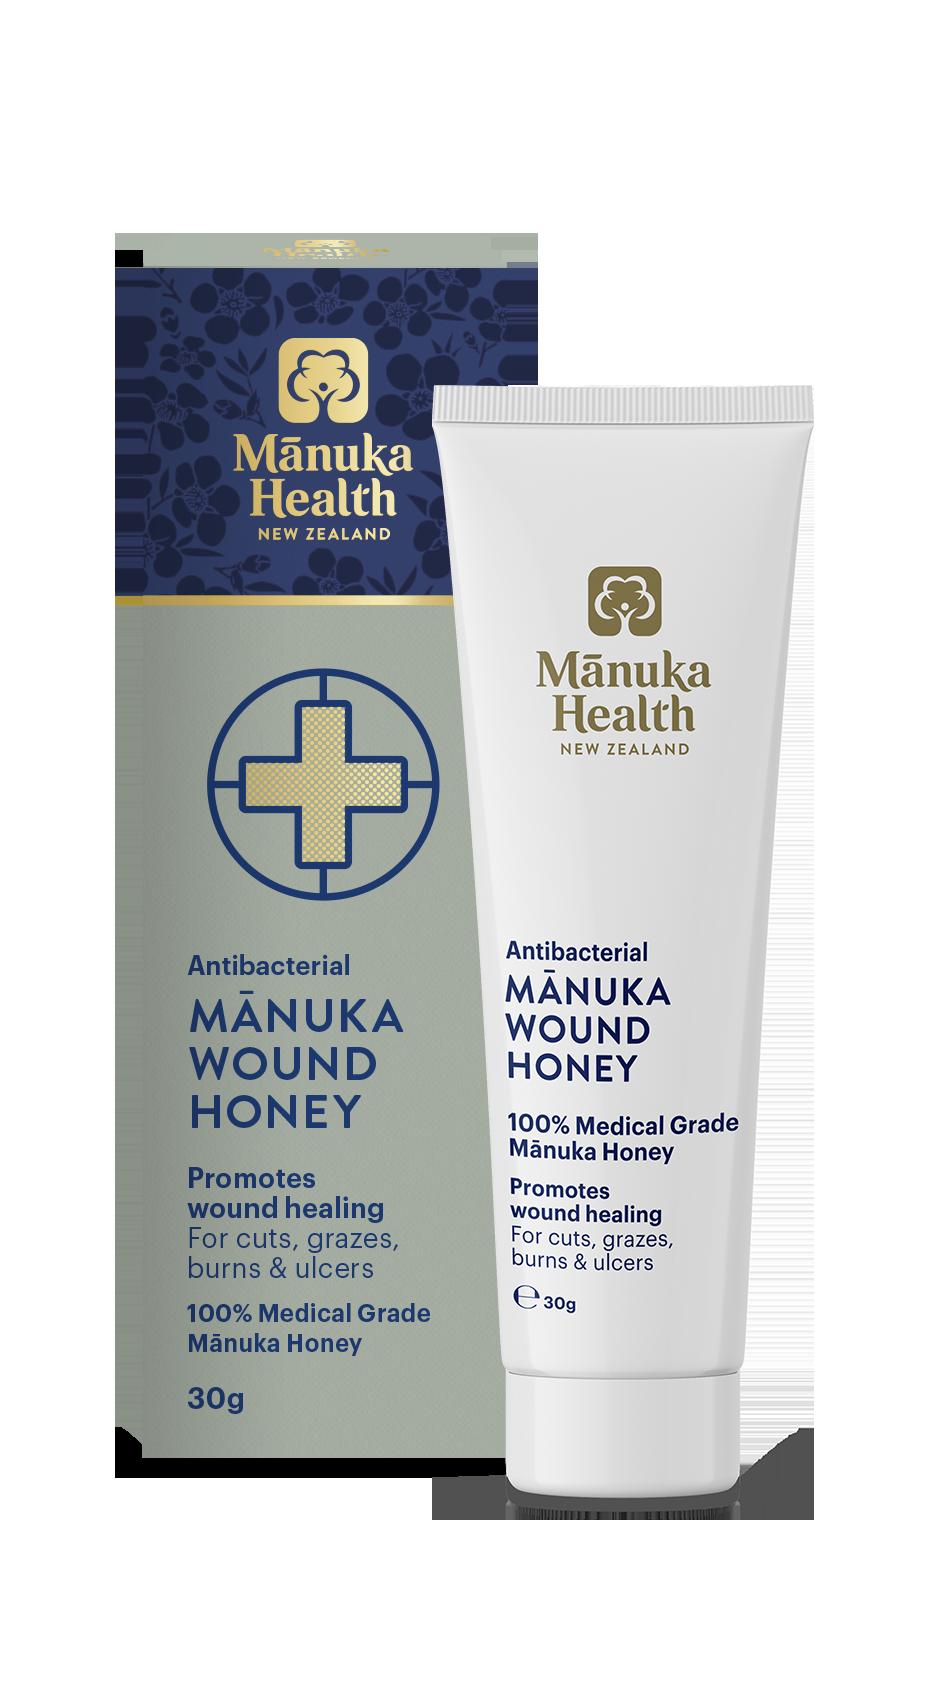 Antibacterial Manuka Wound Honey 30g